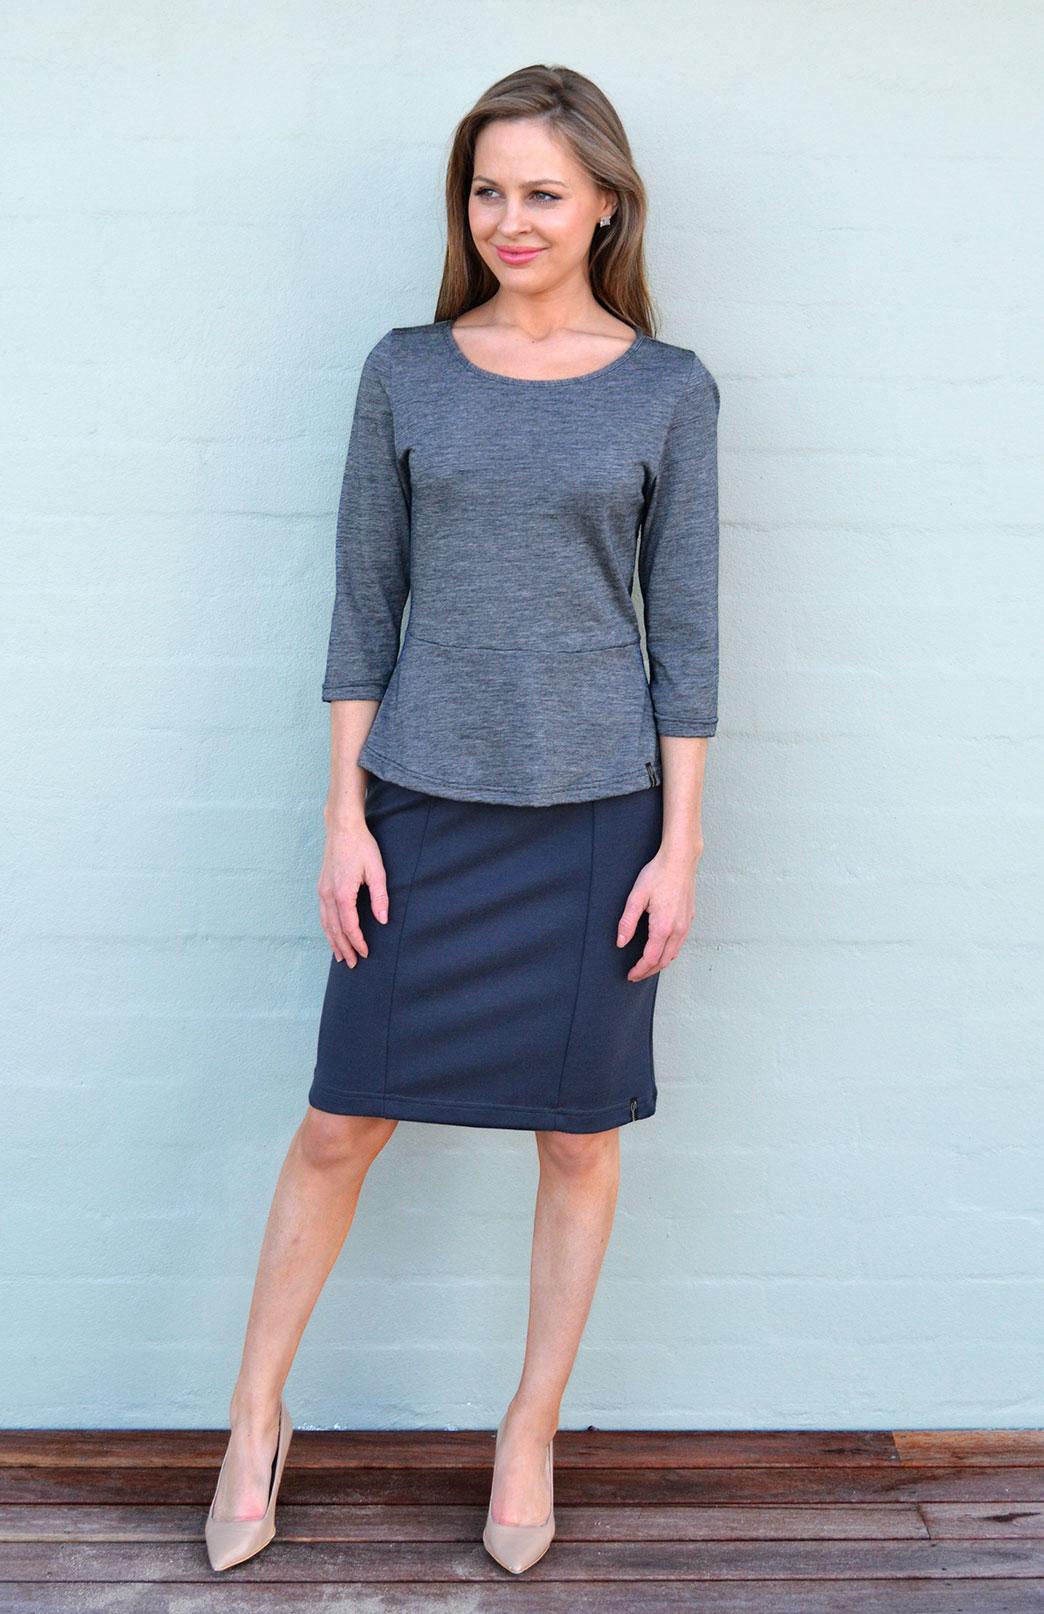 Peplum Top - 3/4 Sleeve - Women's Black Pinstripe Wool Cotton Blend 3/4 Sleeve Spring Top - Smitten Merino Tasmania Australia